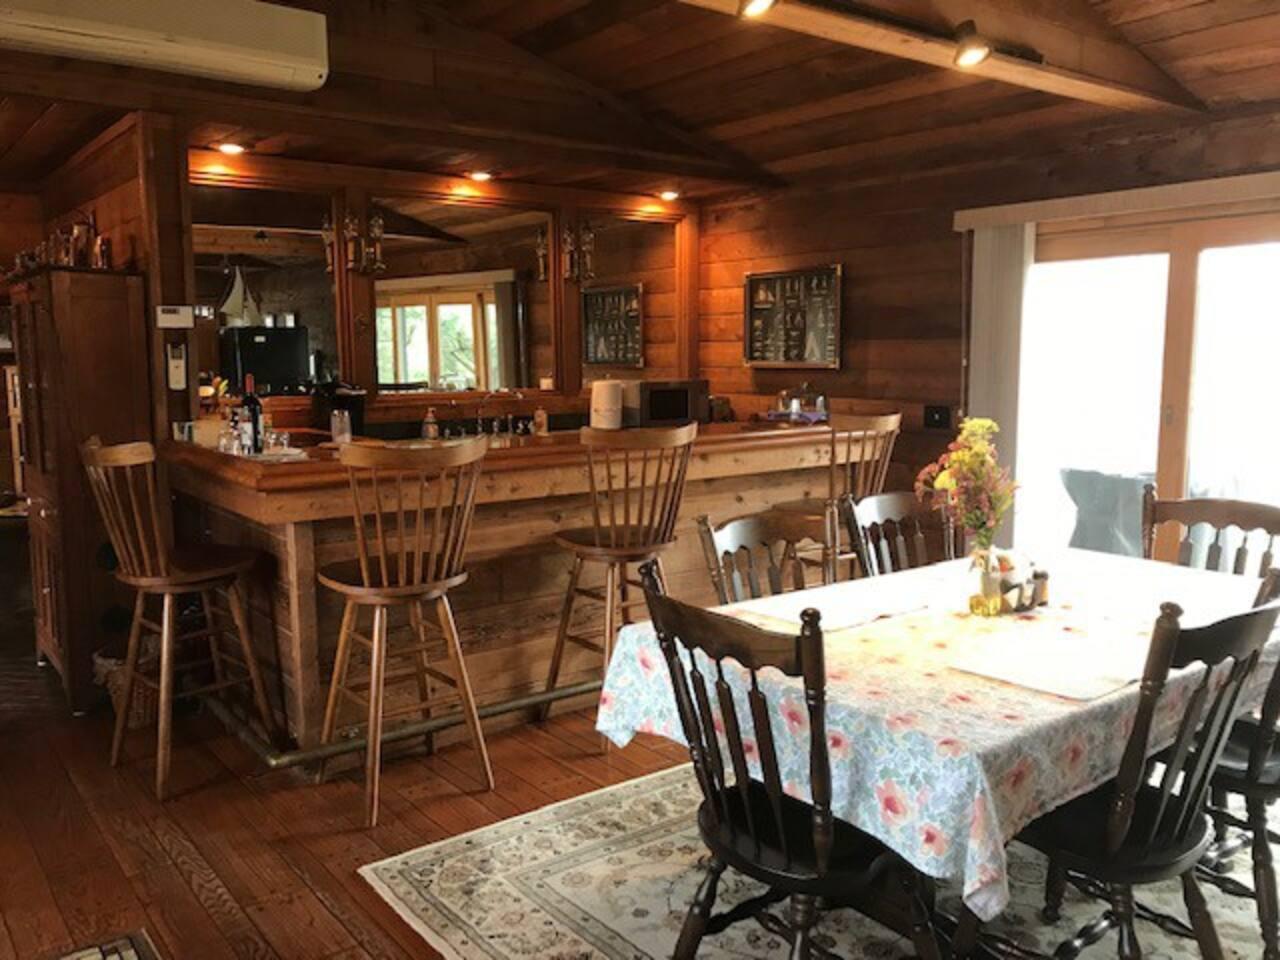 Bar/Kitchen/Dining Area